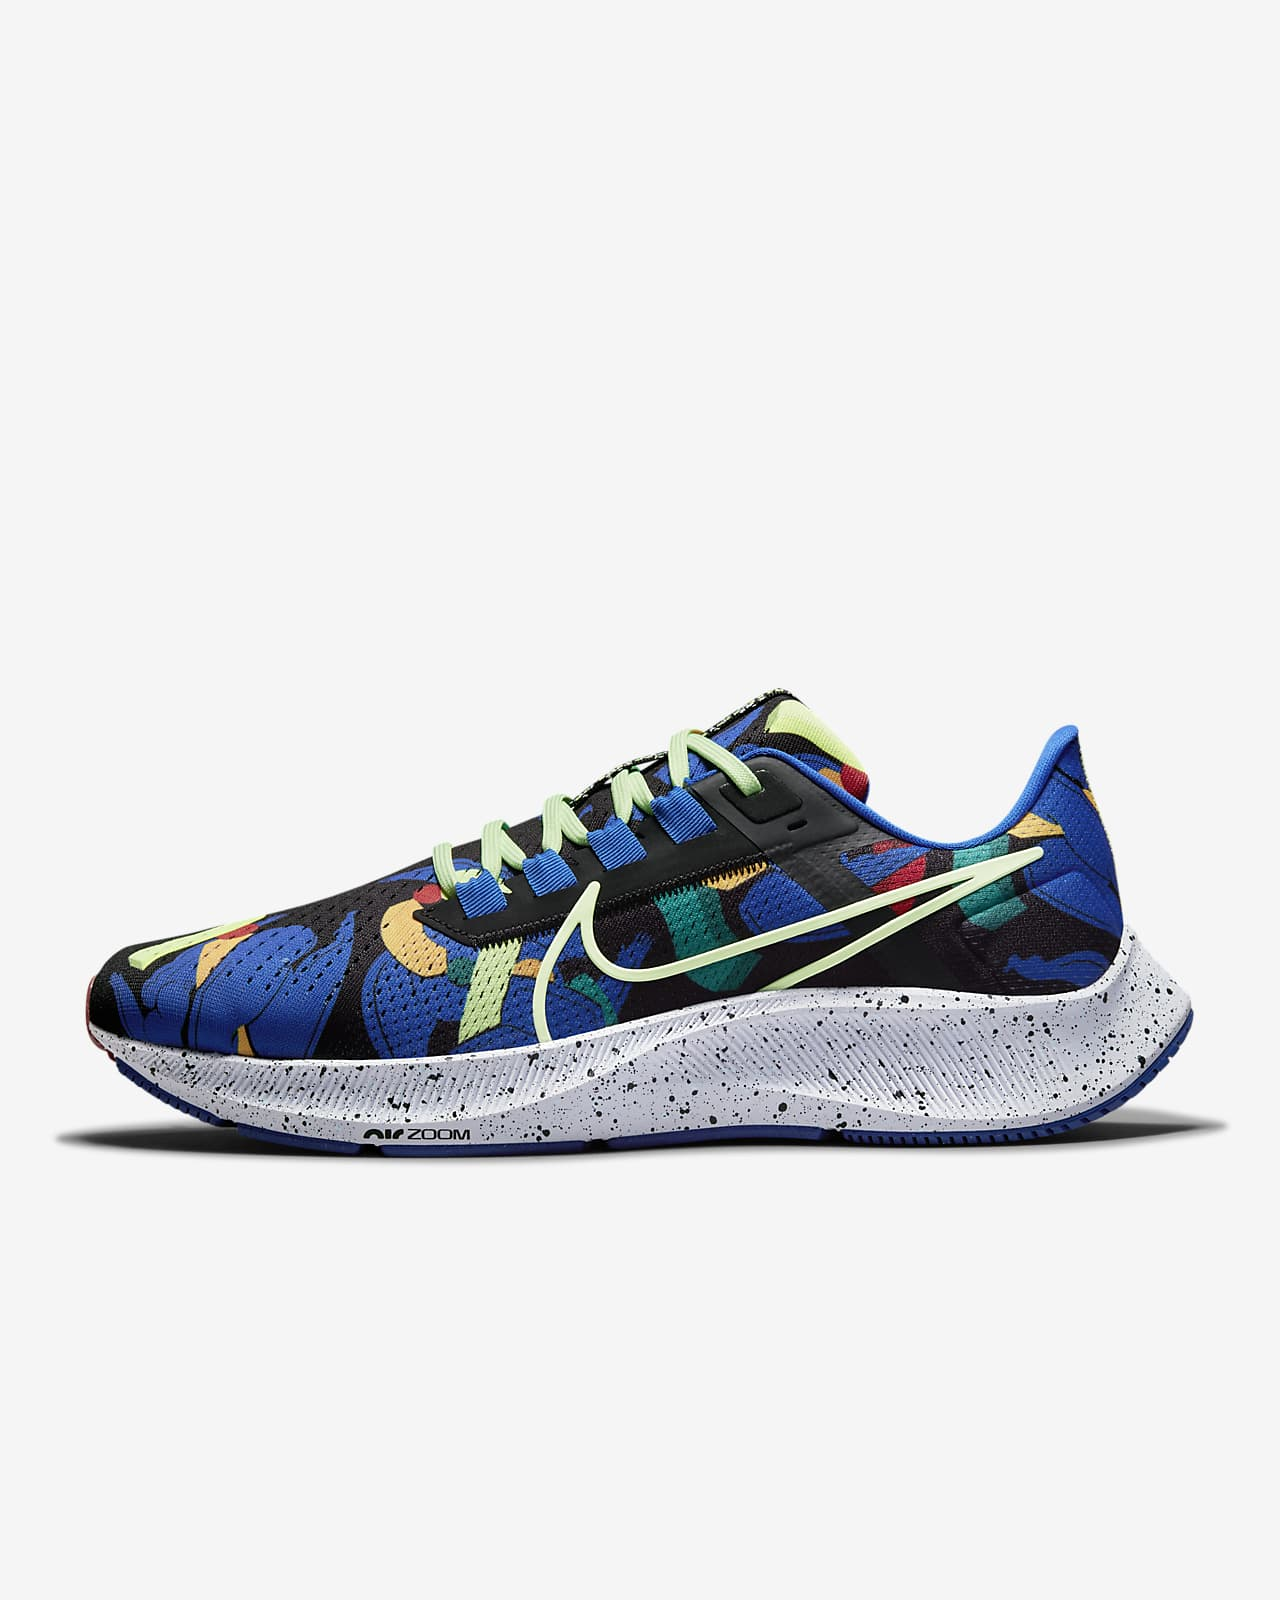 Nike Air Zoom Pegasus 38 A.I.R. Chaussure de running Kelly Anna London pour Homme